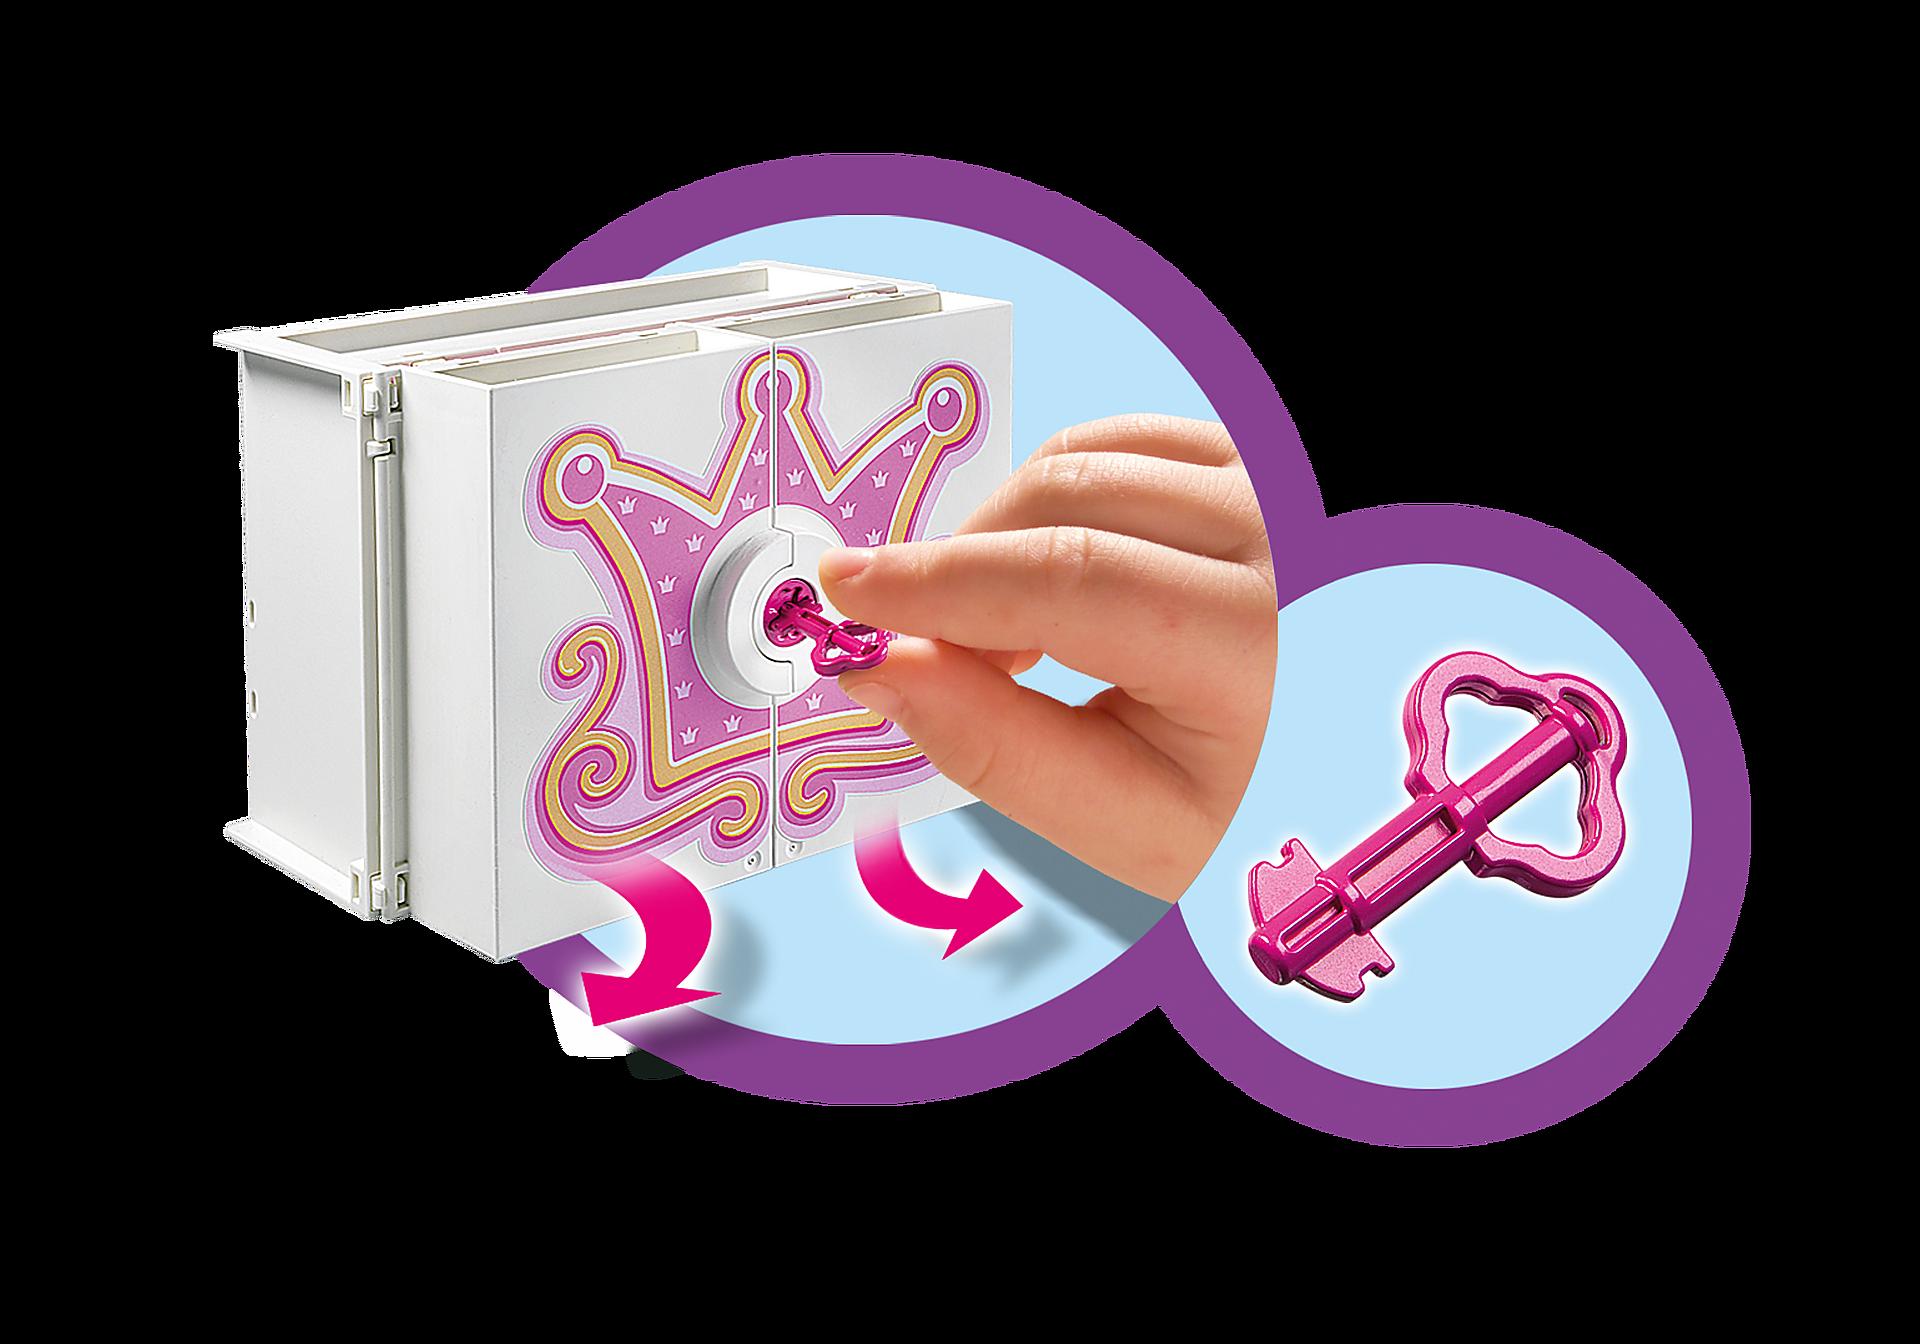 http://media.playmobil.com/i/playmobil/4898_product_extra3/My Secret Royal Palace Play Box